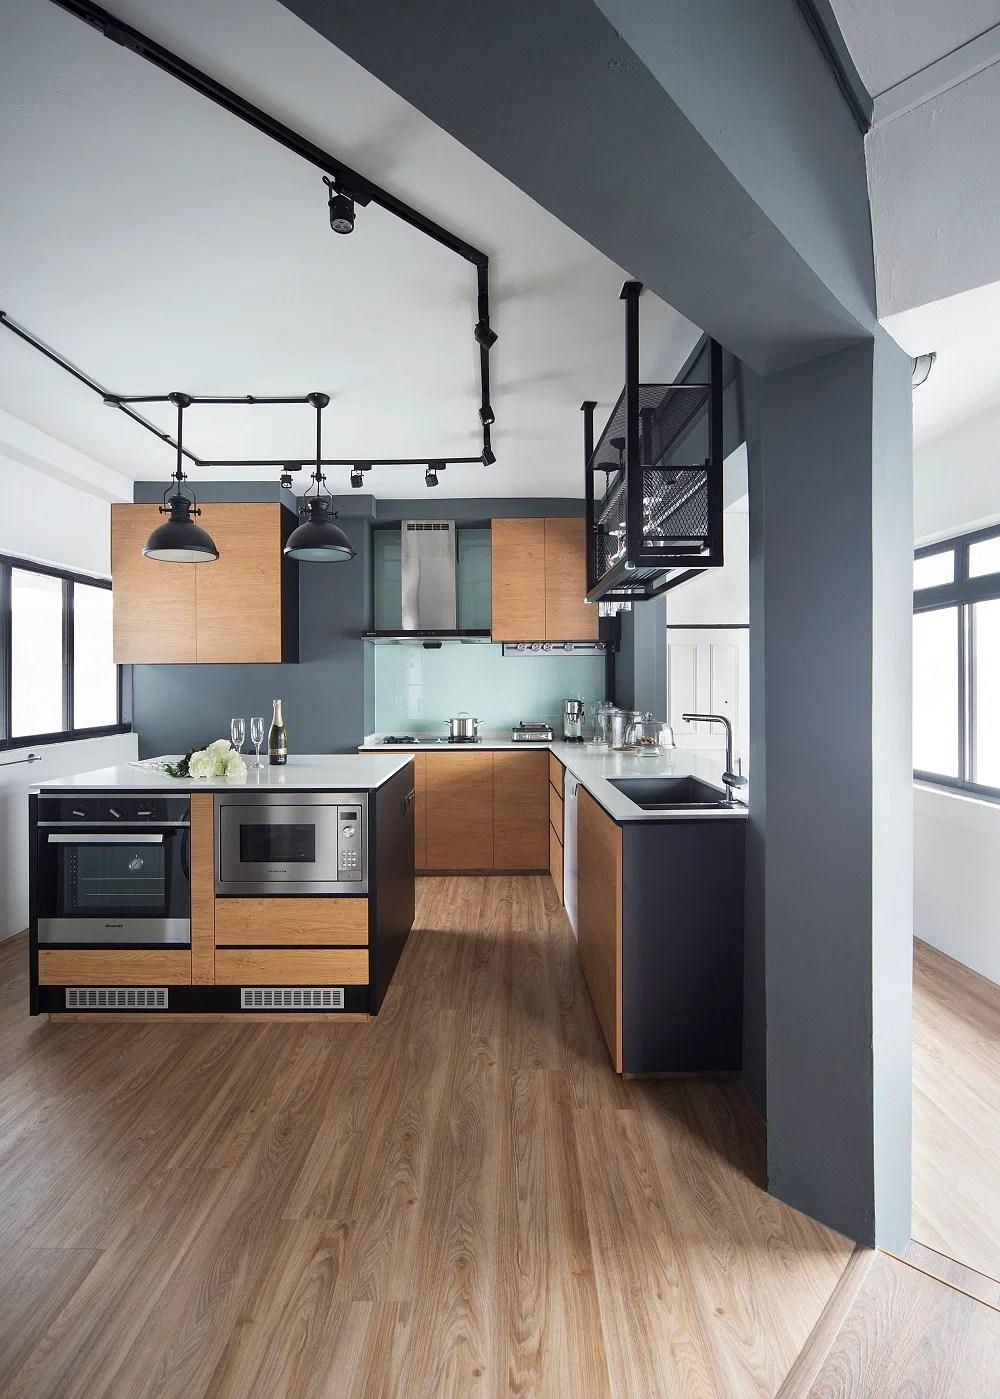 House Tour 60000 Minimalist Industrial Four Room HDB Flat Home Amp Decor Singapore